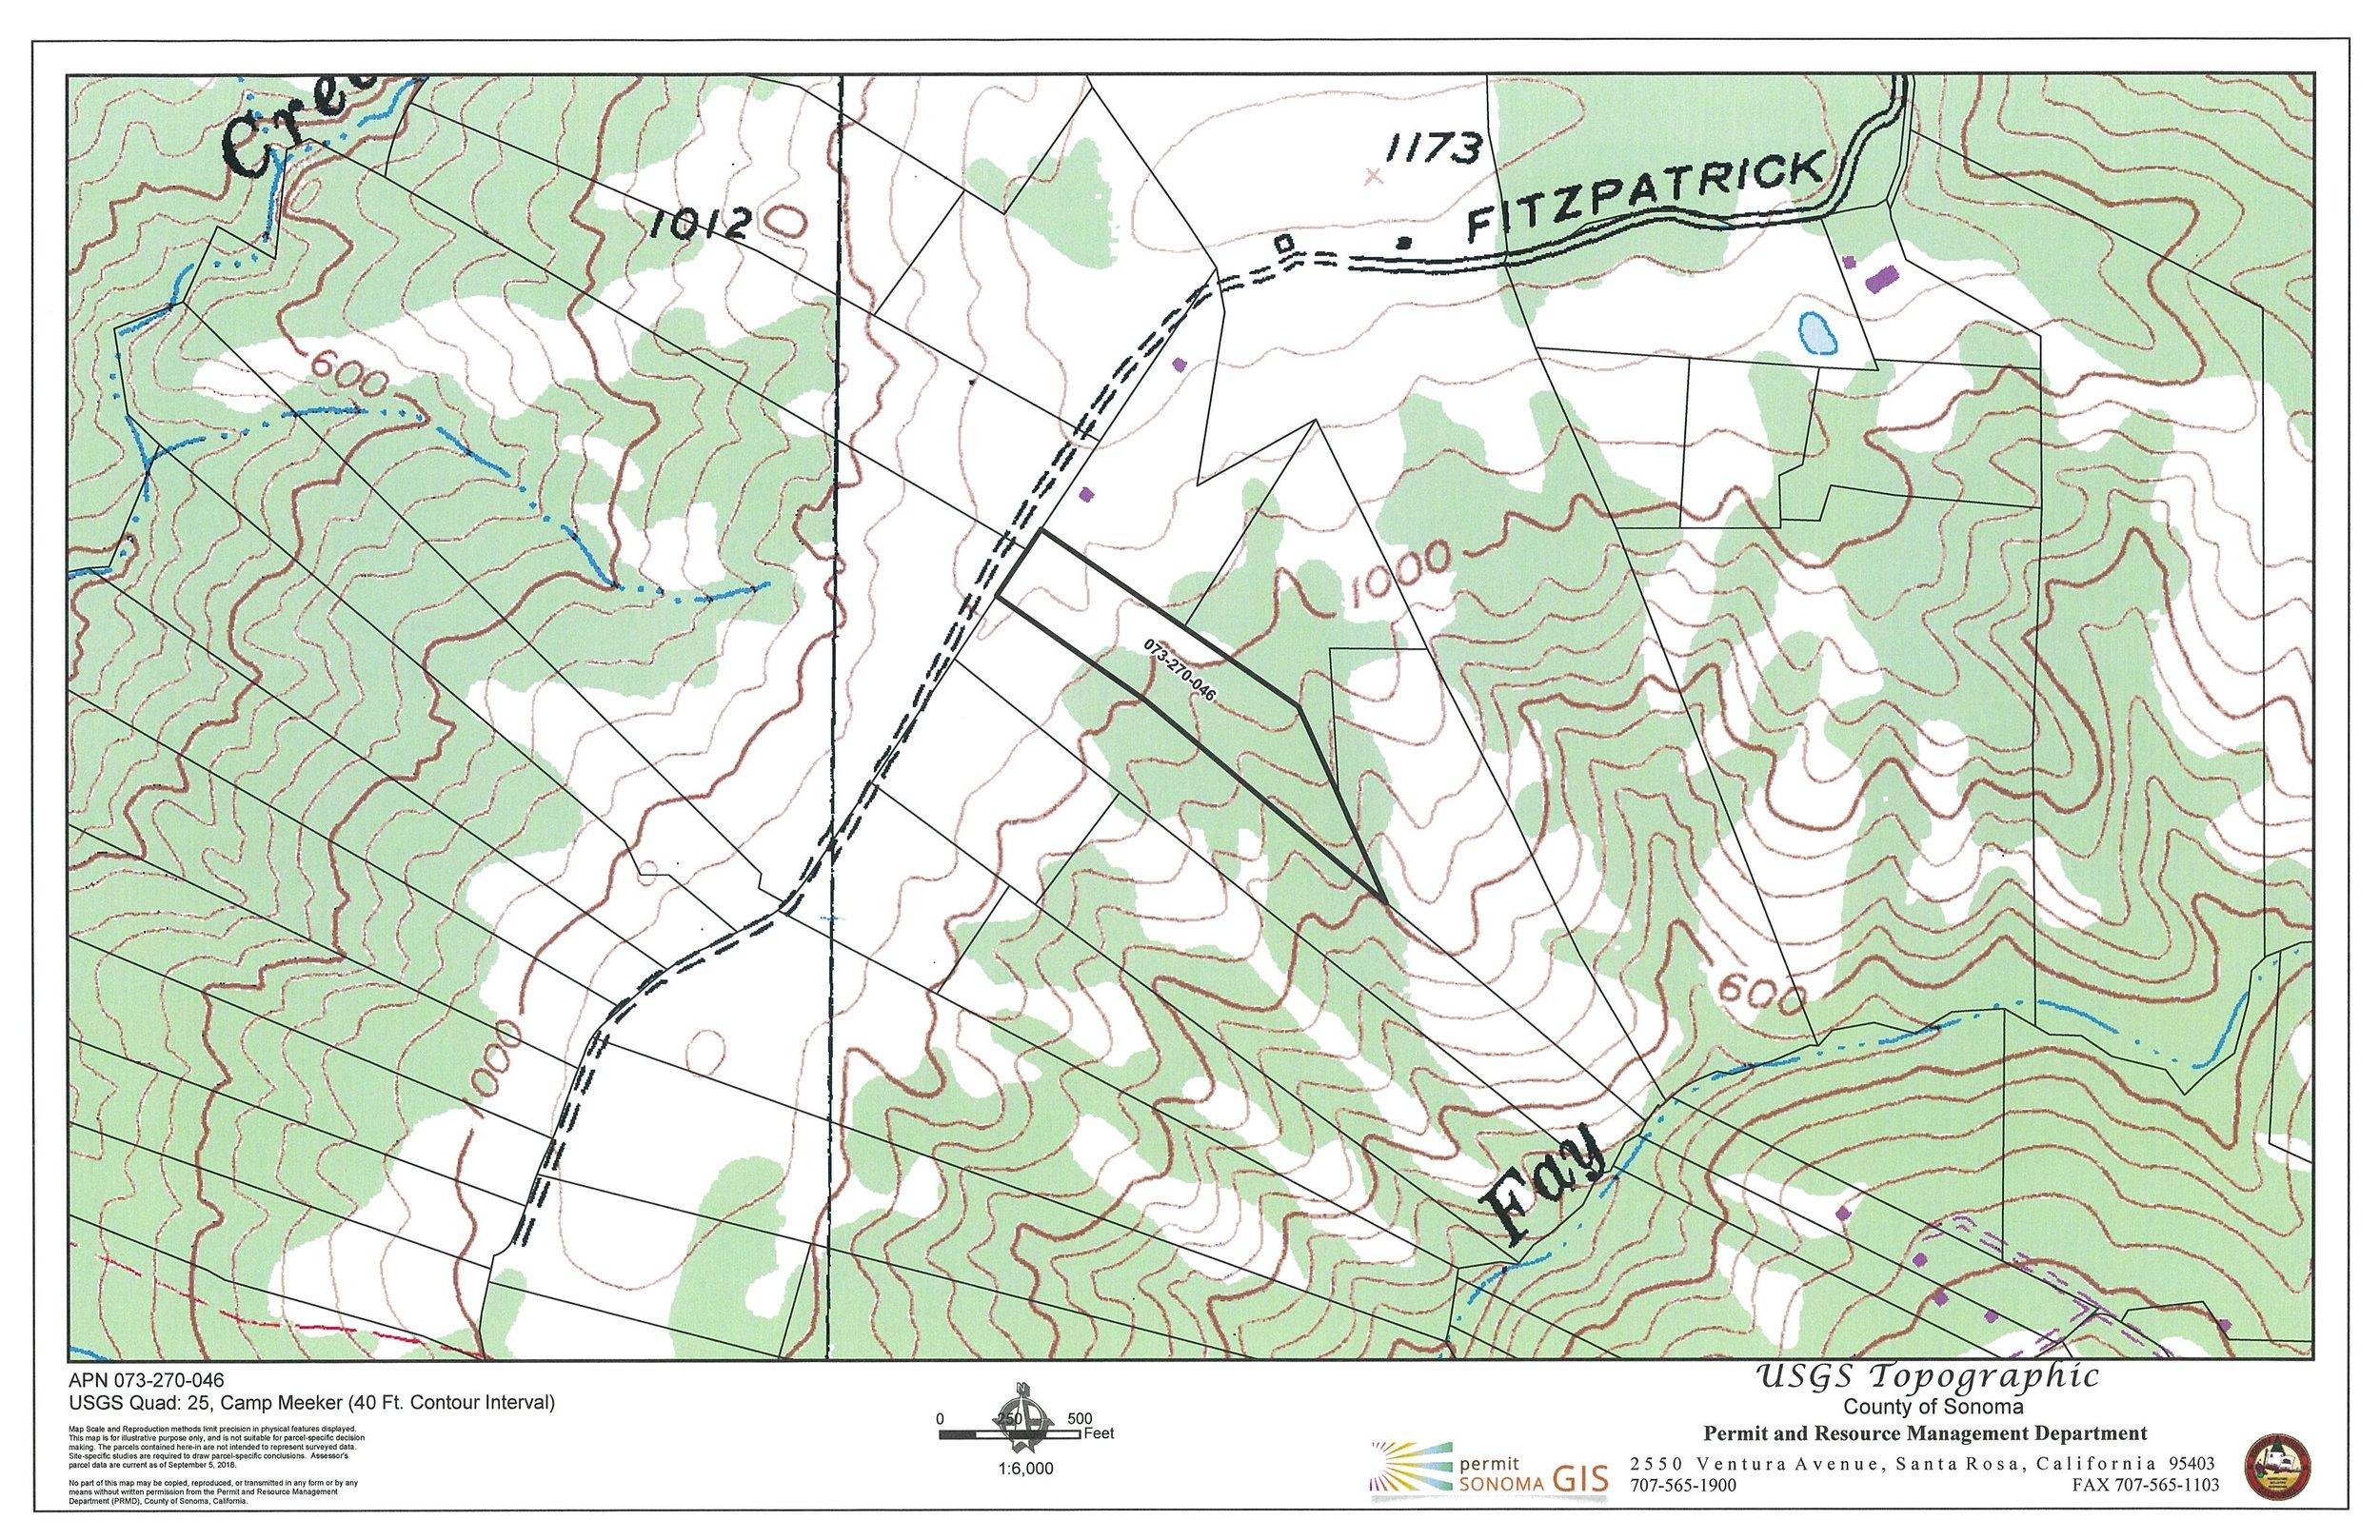 18253 Fitzpatrick Topography.jpg